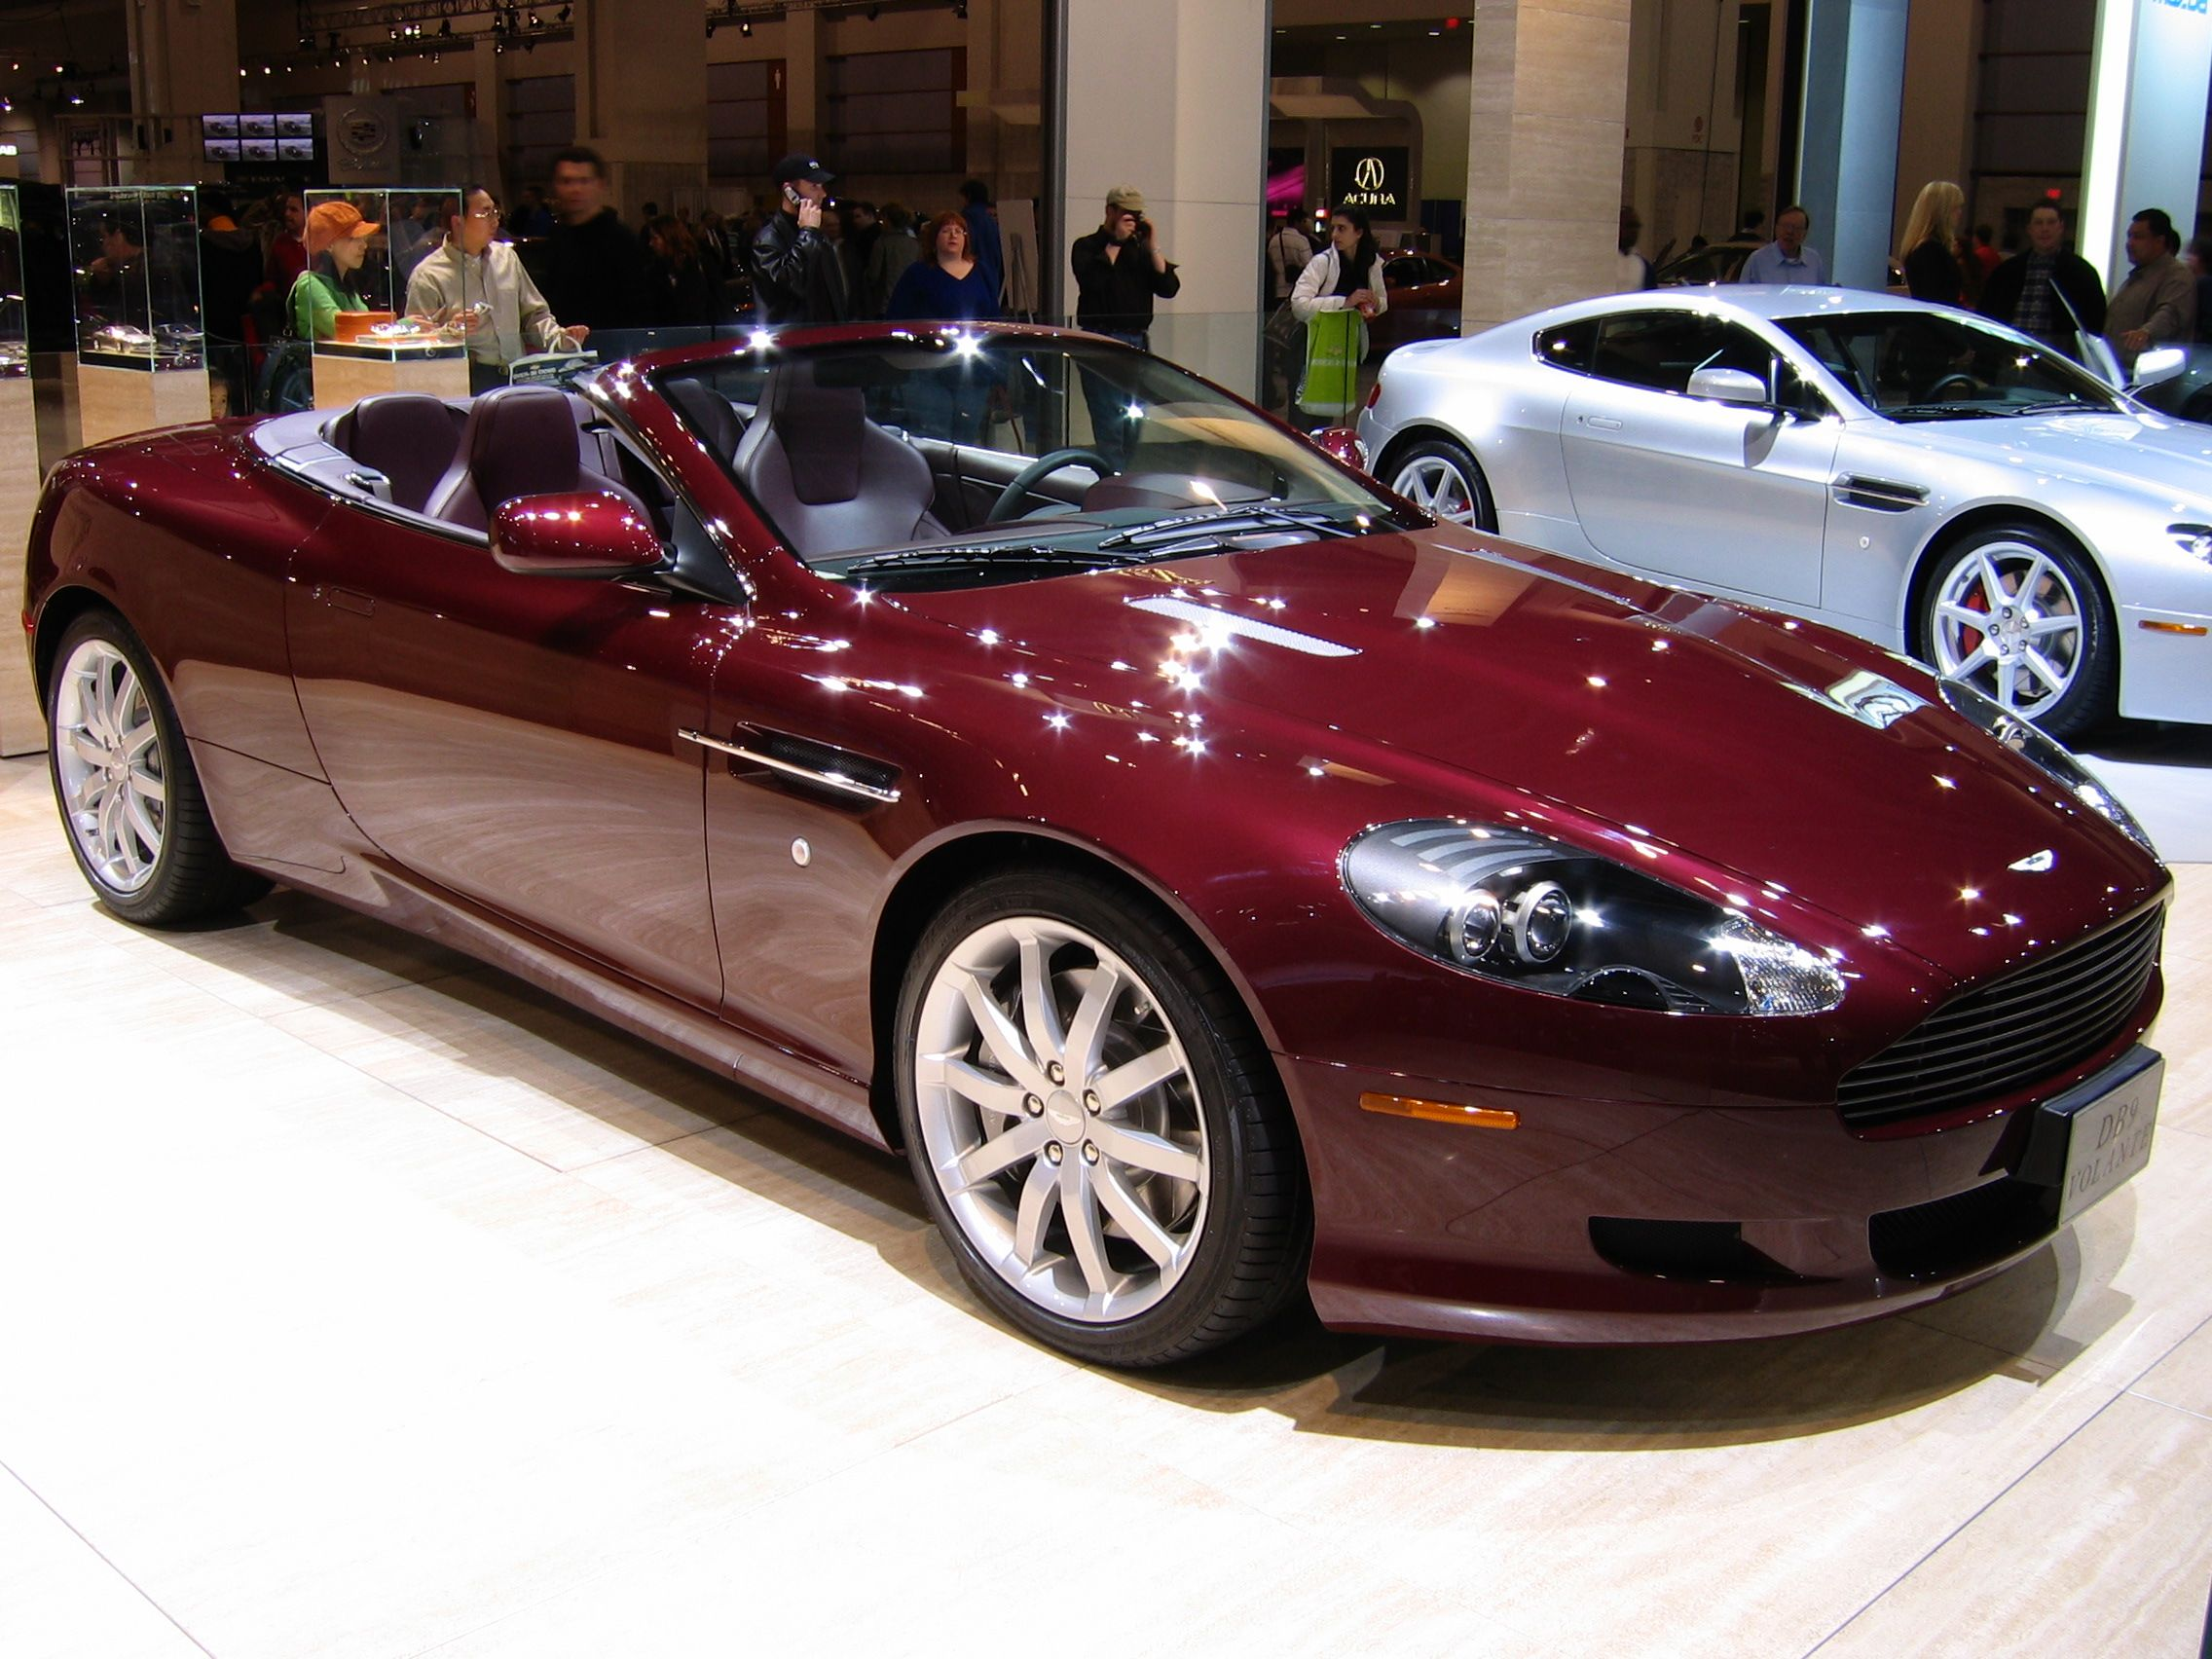 Aston Martin Db9 Specs Topismag Net Aston Martin Aston Martin Vanquish Aston Martin Cars